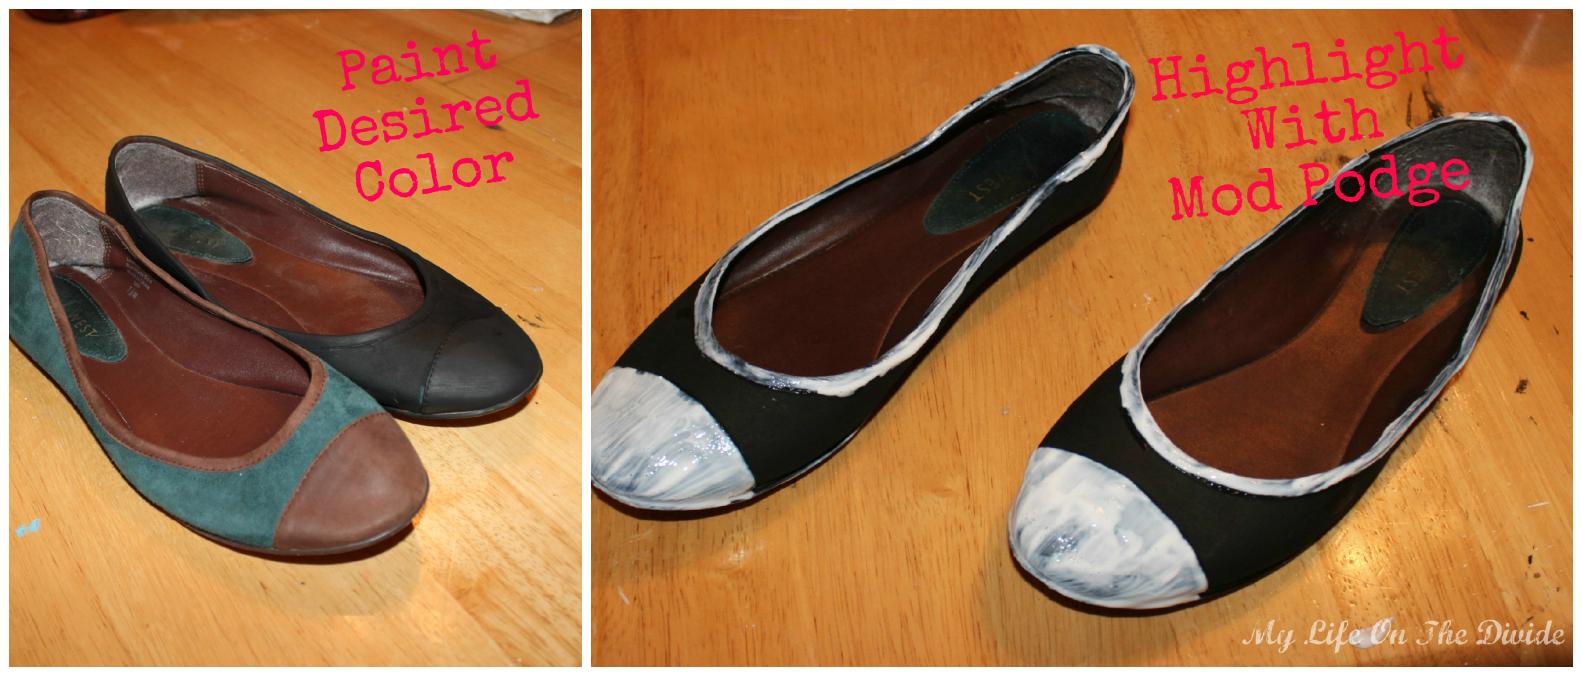 spray dye for suede shoes. Black Bedroom Furniture Sets. Home Design Ideas